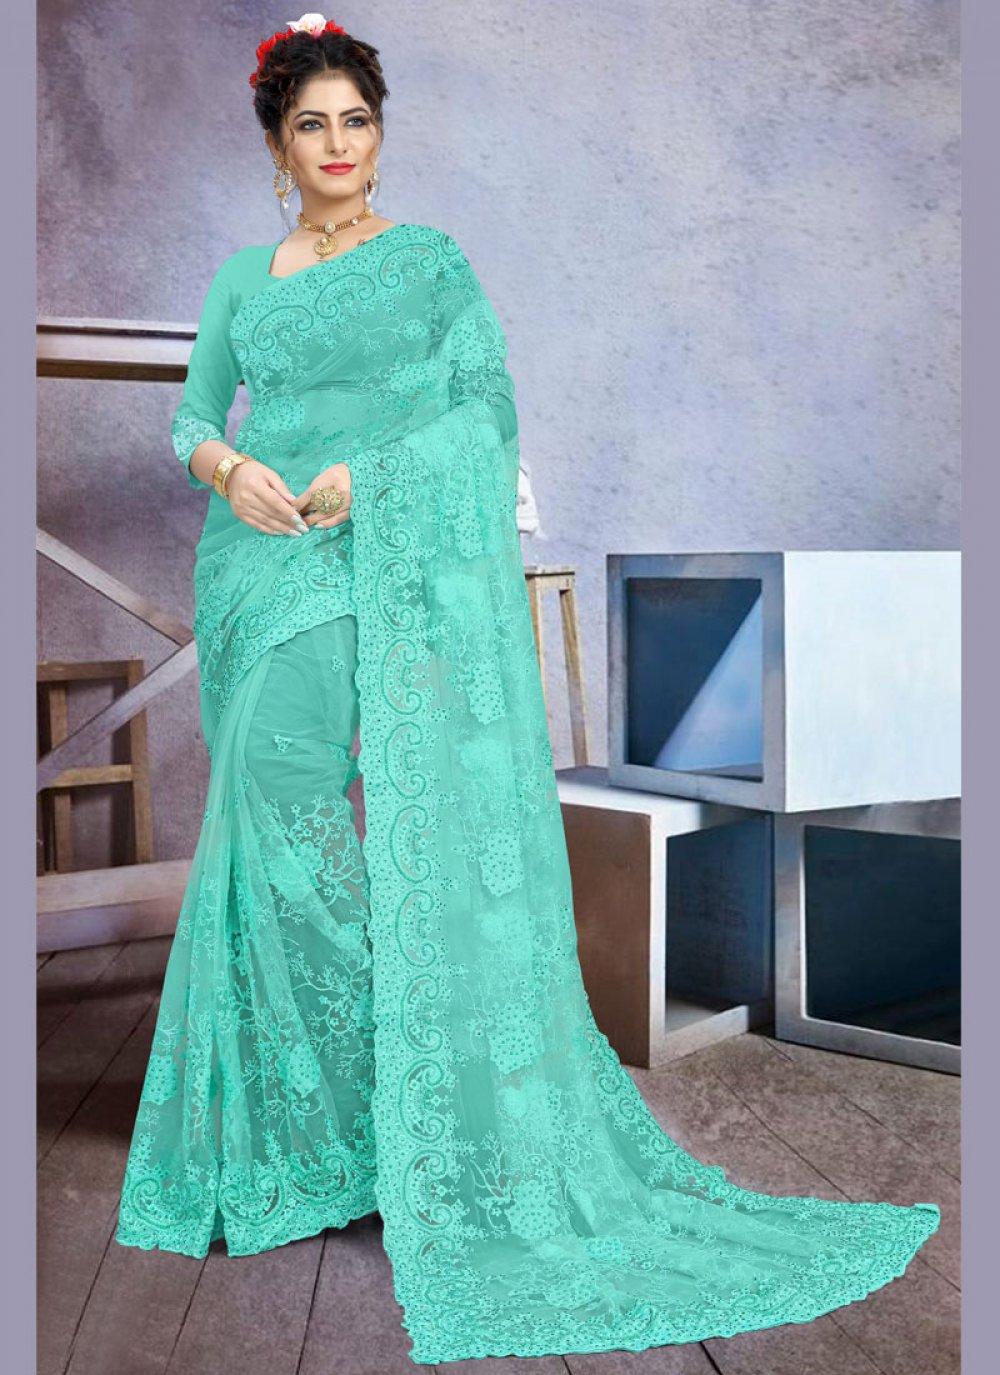 Net Embroidered Contemporary Saree in Aqua Blue